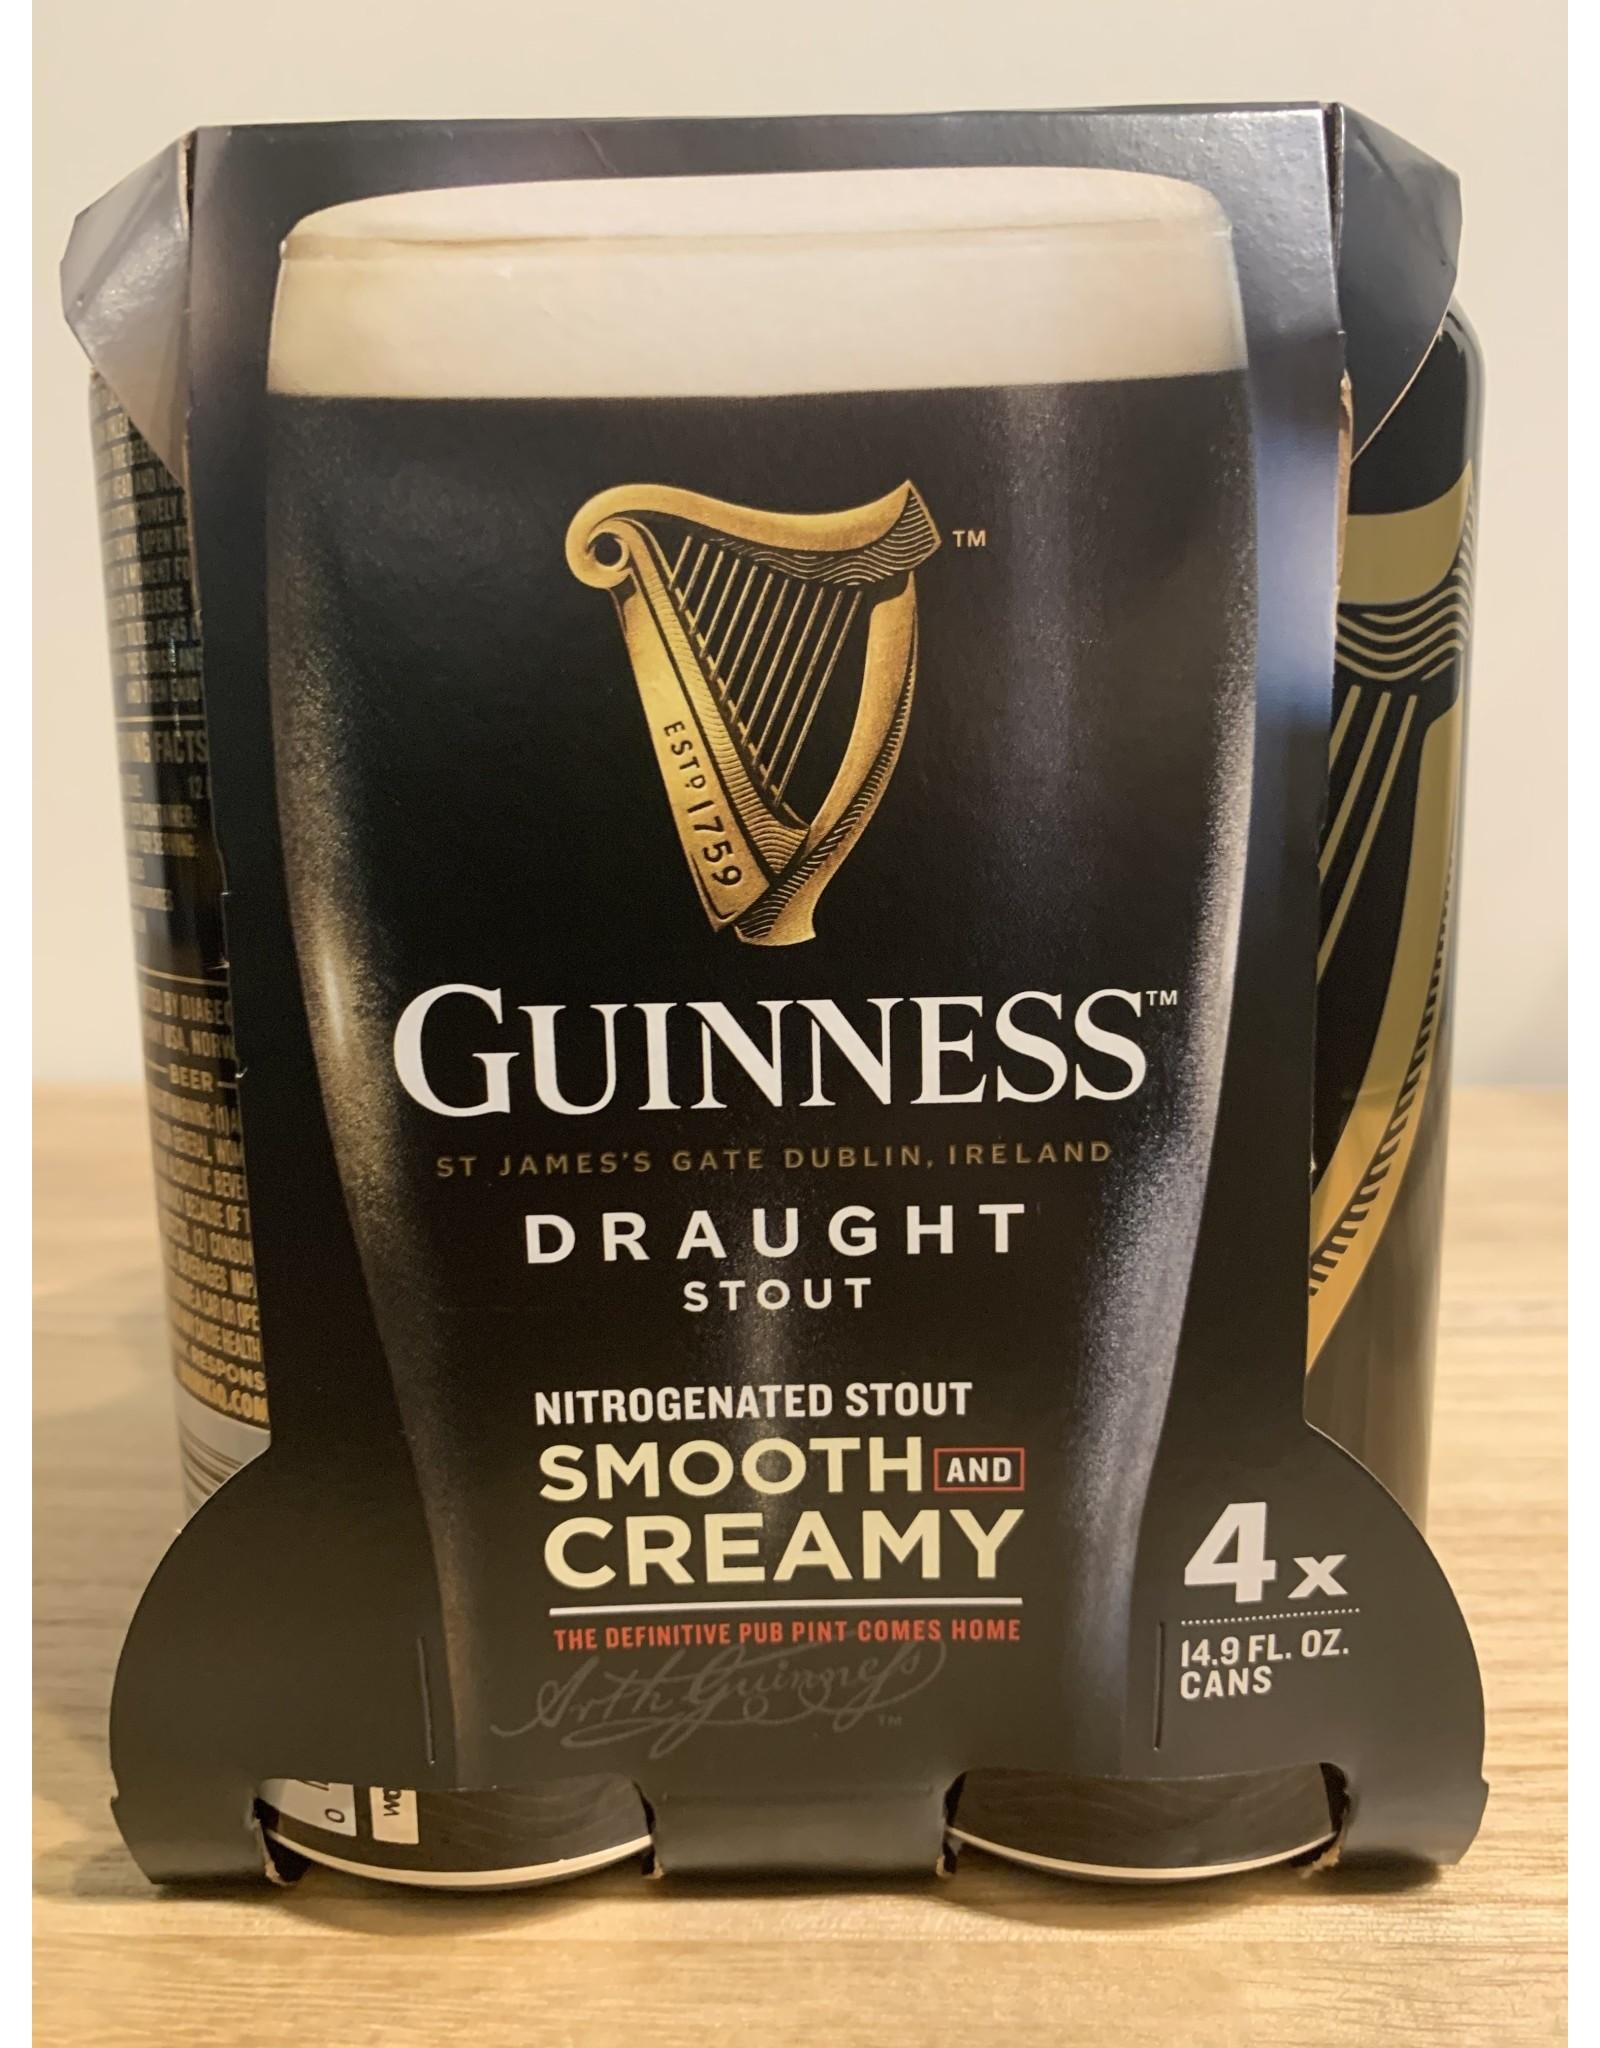 Guinness Guinness Drought Stout